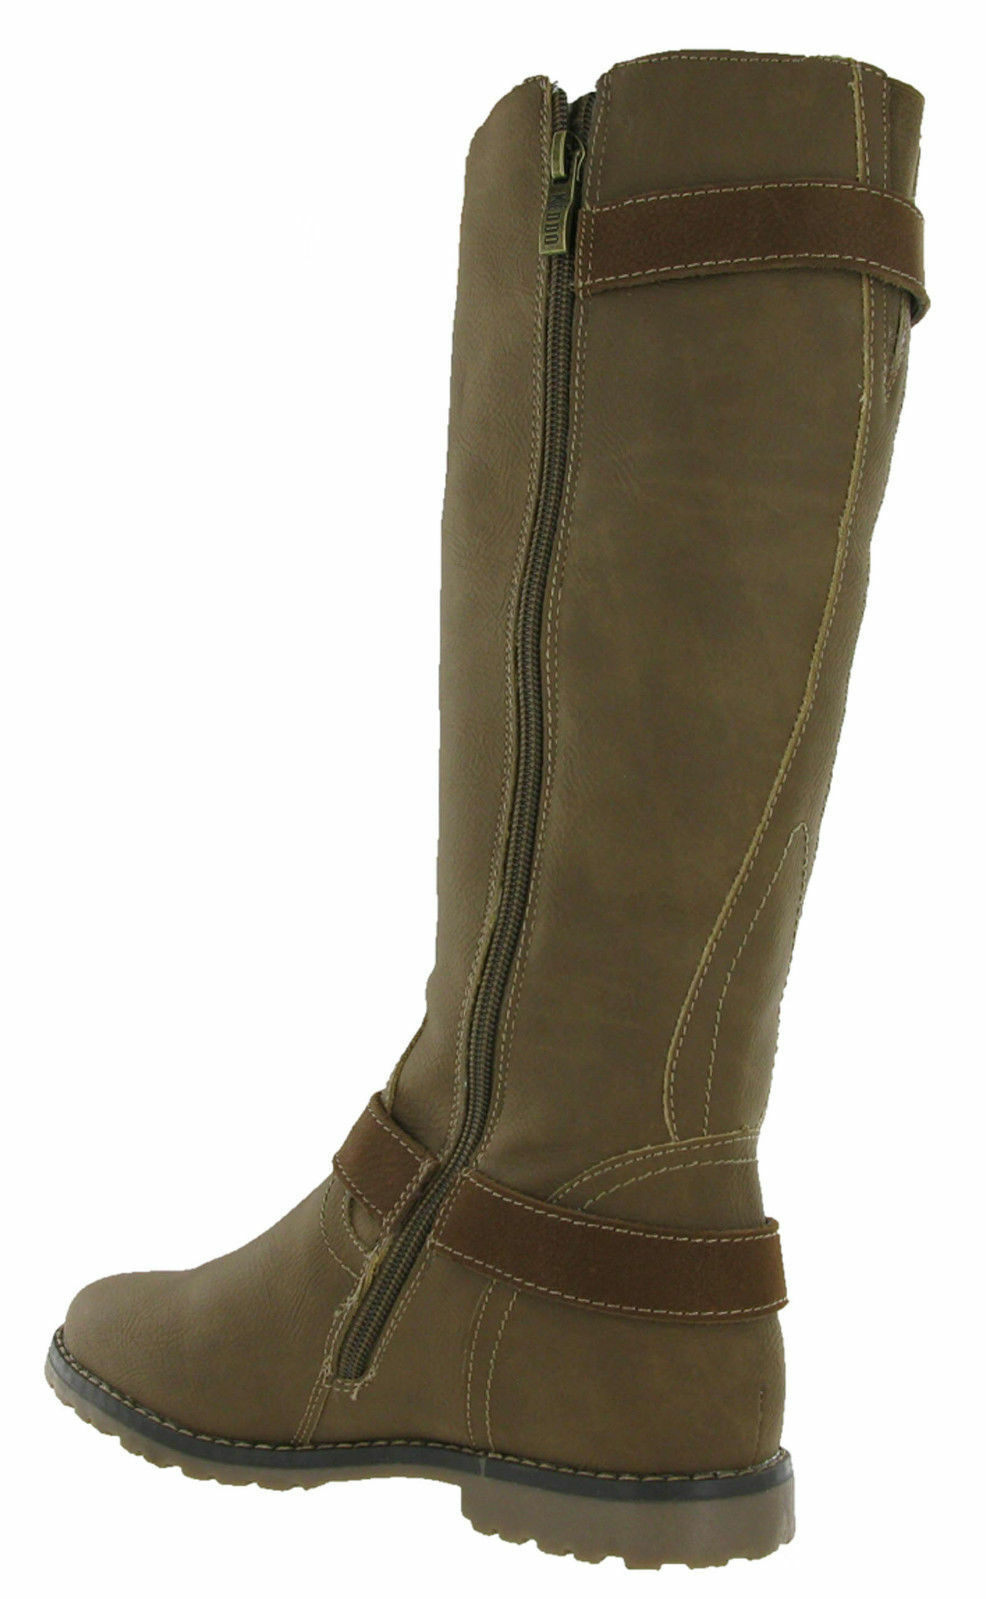 Damenschuhe Keddo High Knee High Keddo Camel Suede Stiefel a2bbe7